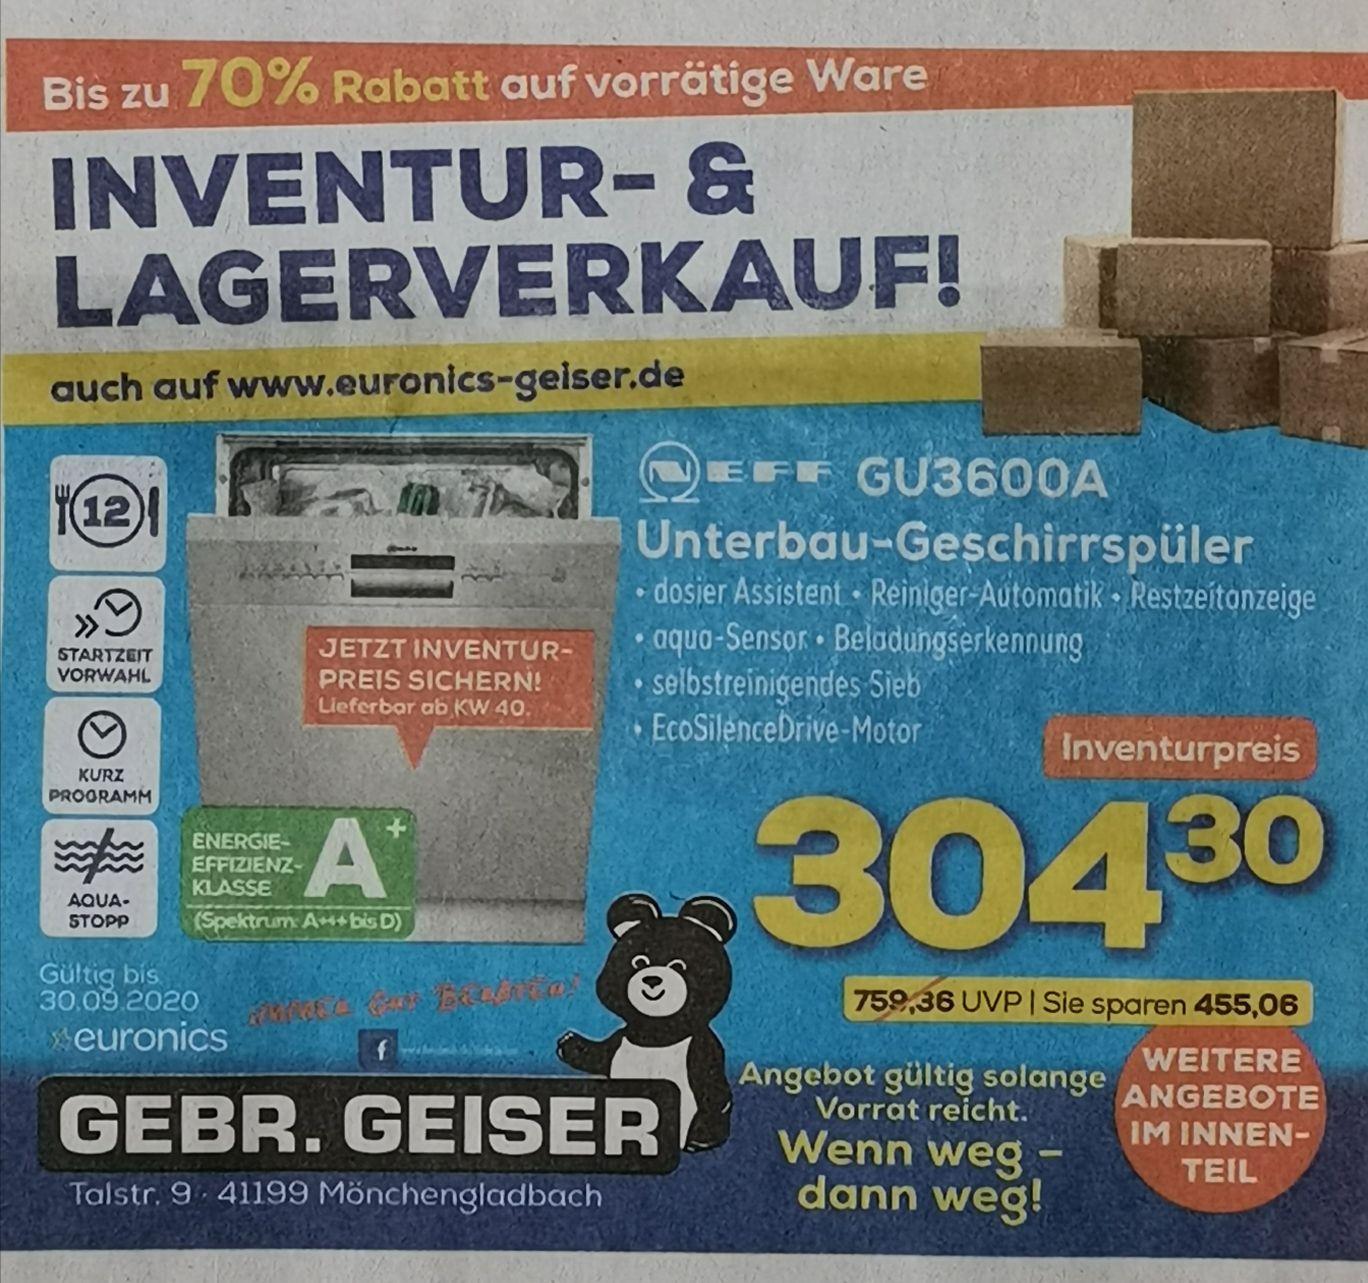 Neff GU3600A Unterbau-Geschirrspüler